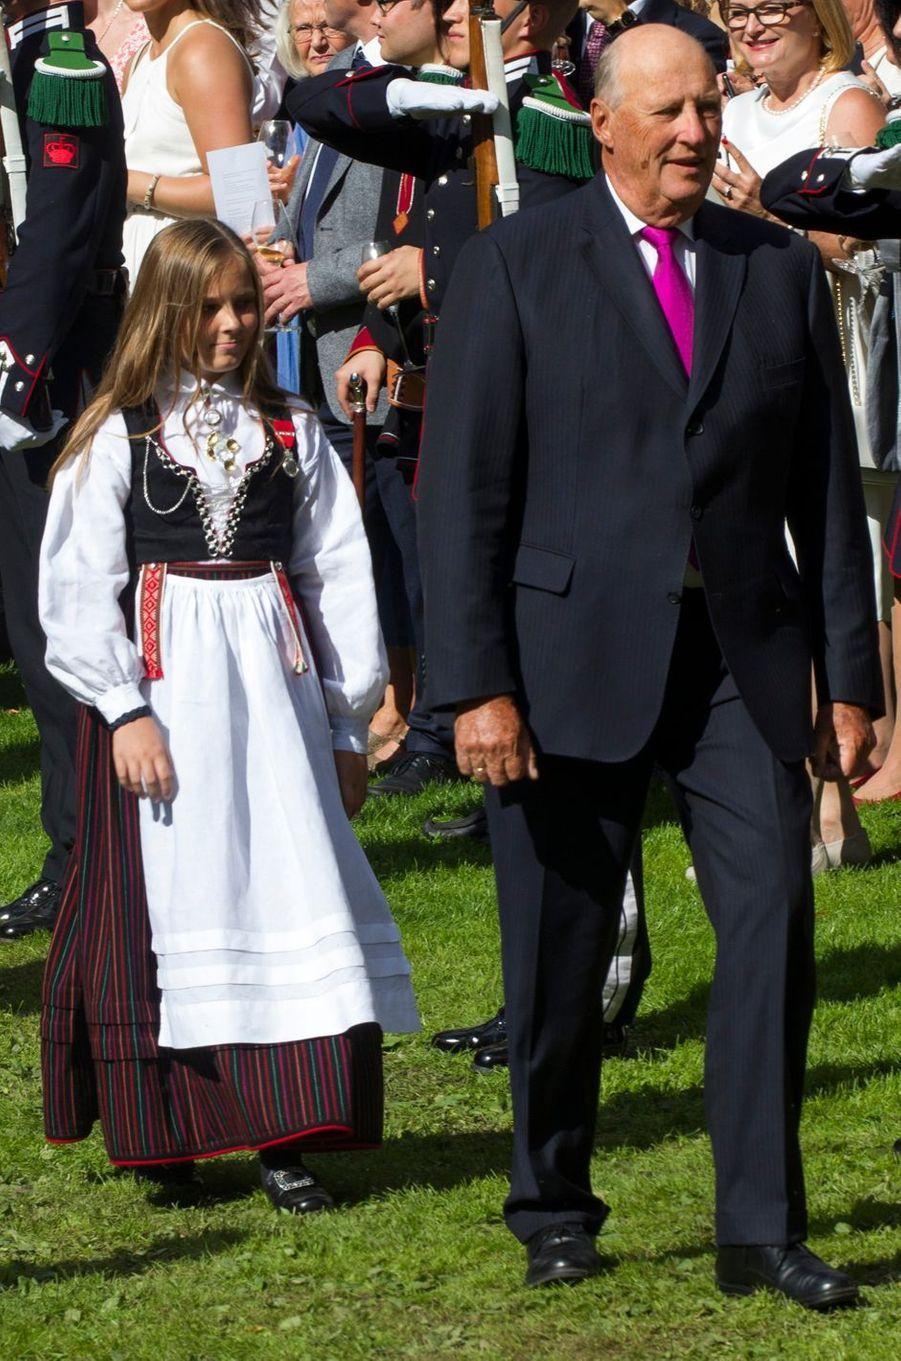 La princesse Ingrid Alexandra avec le roi Harald V de Norvège à Oslo, le 1er septembre 2016